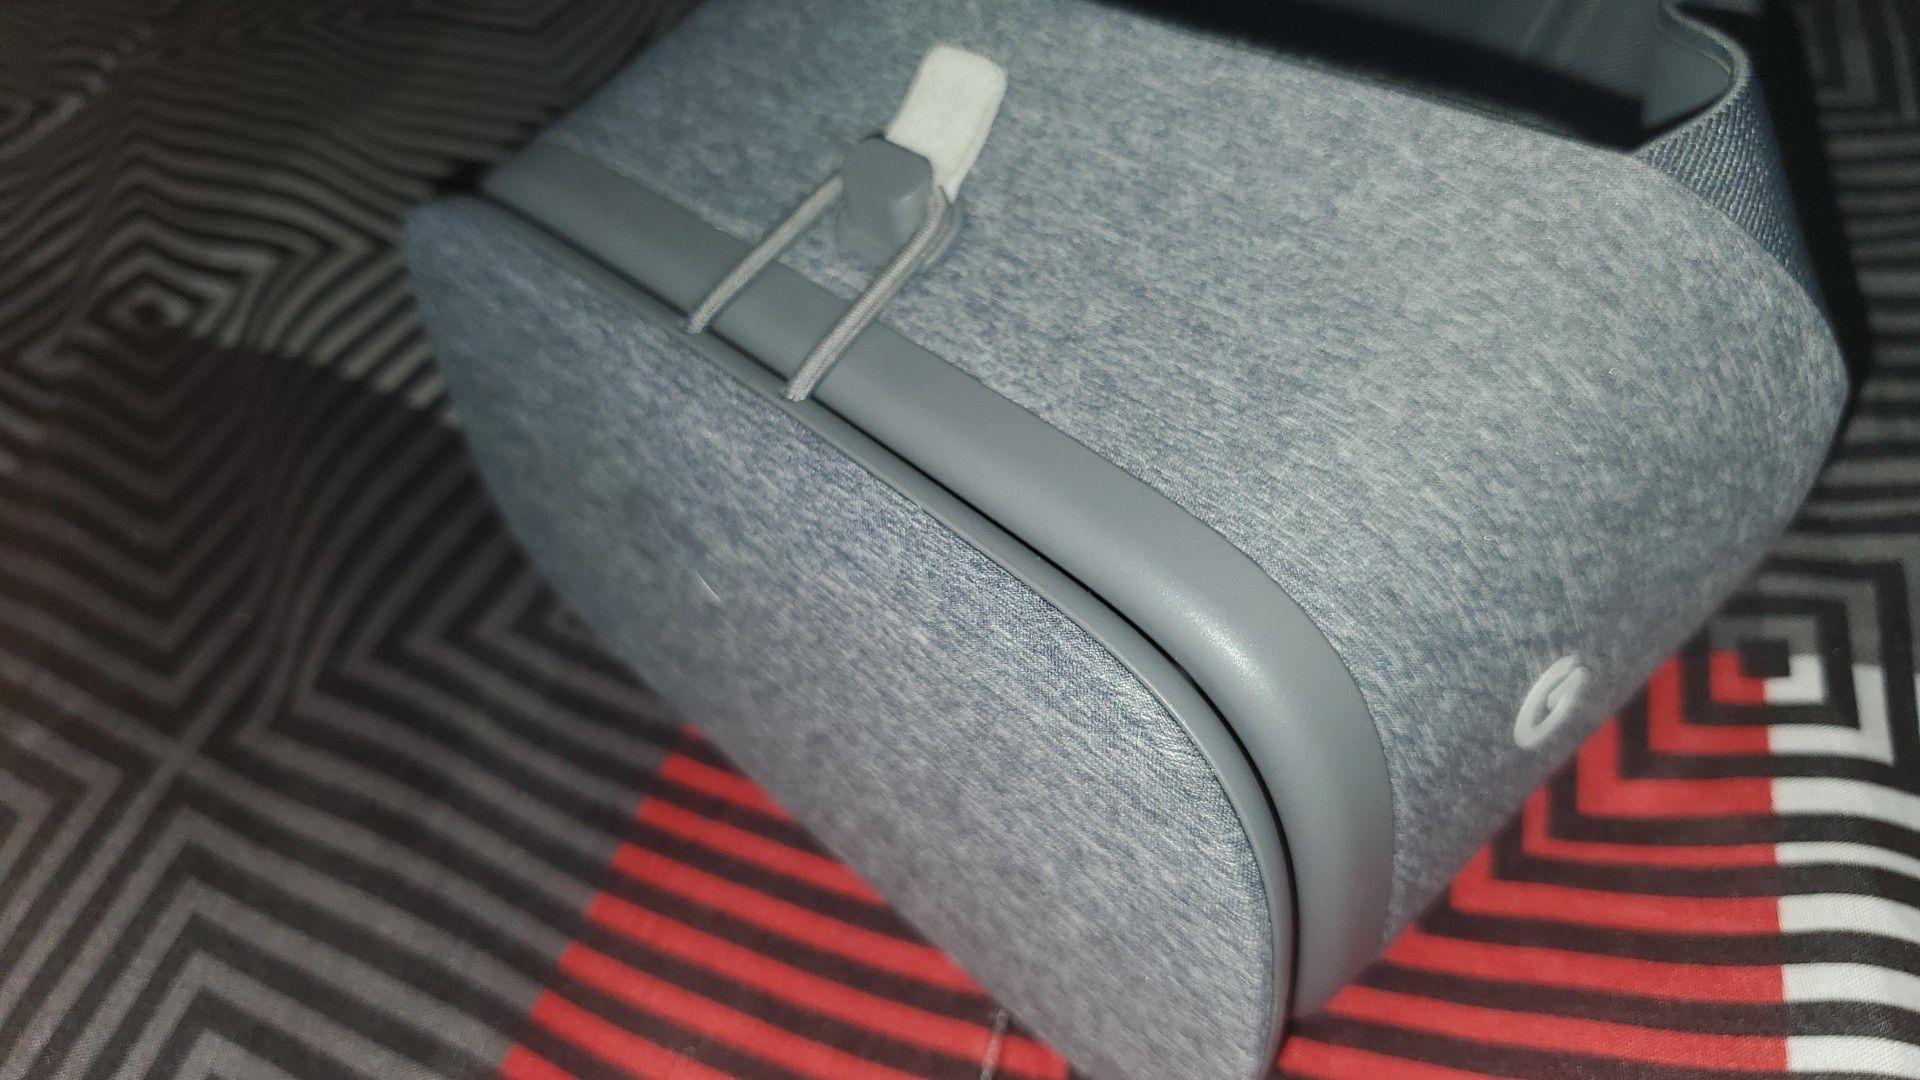 Google - Daydream View VR Headset - Slate